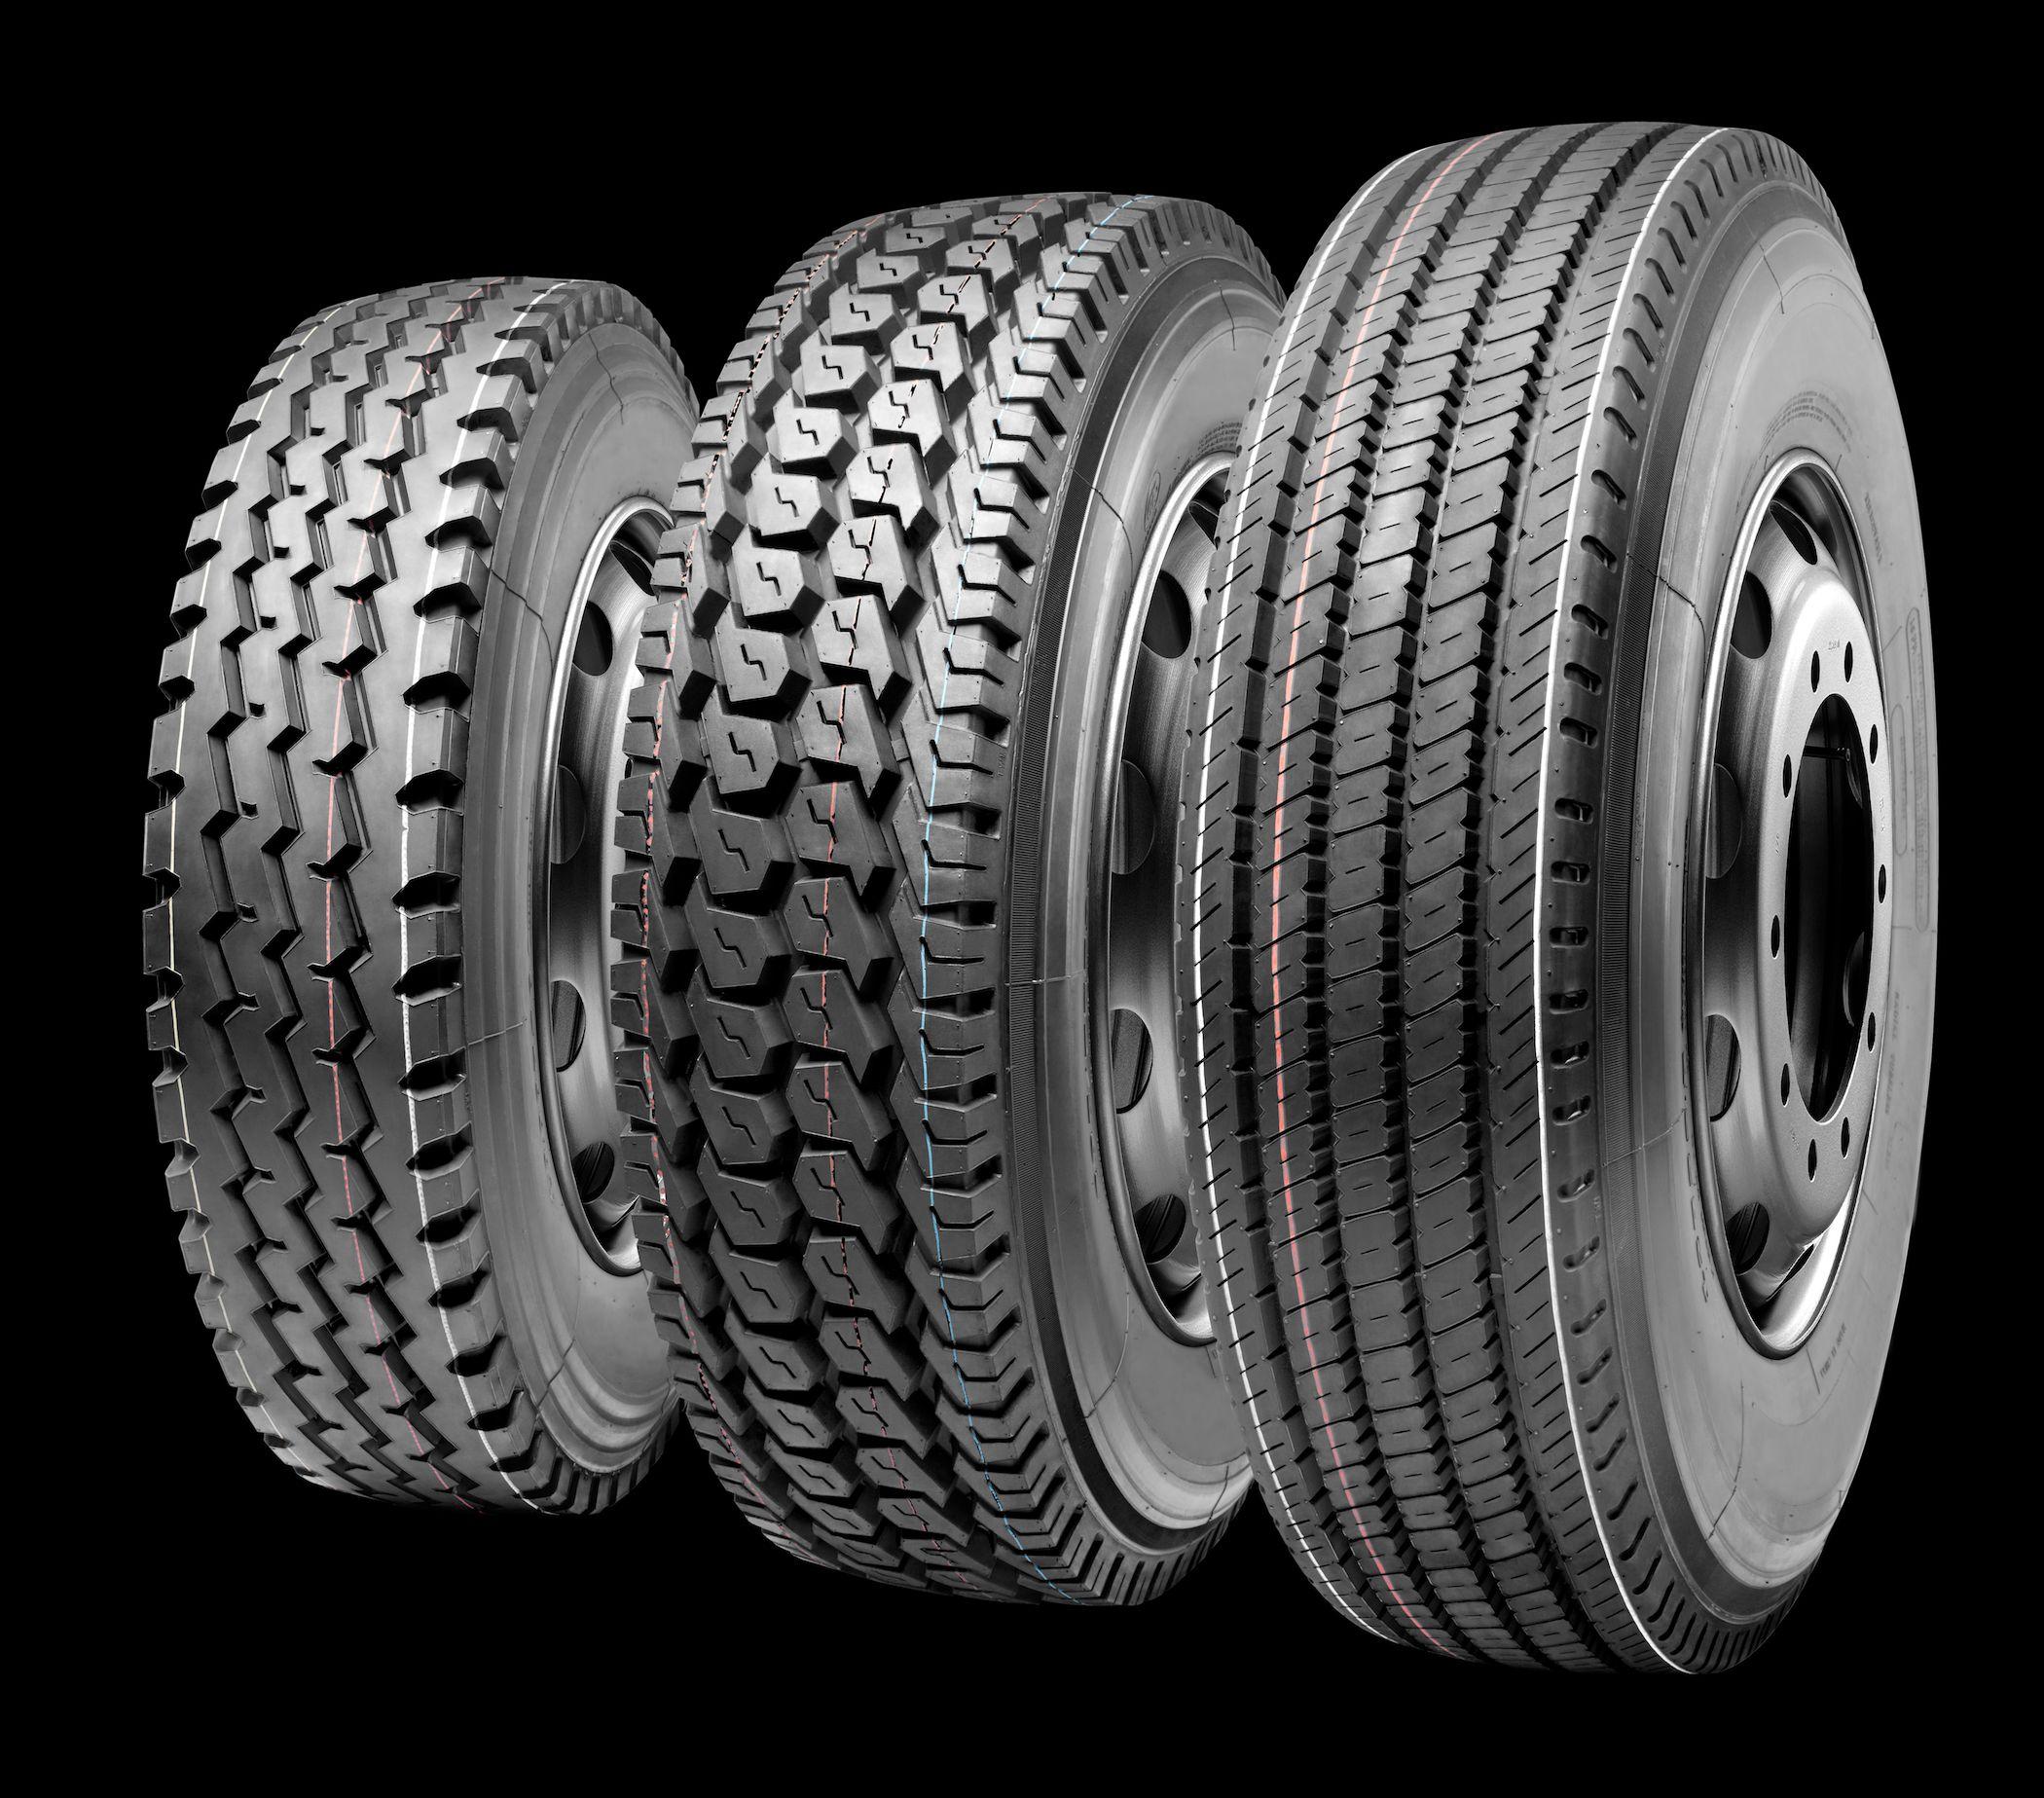 Alliance Tire Group Unveils Its Constellation Medium Truck Tire Brand